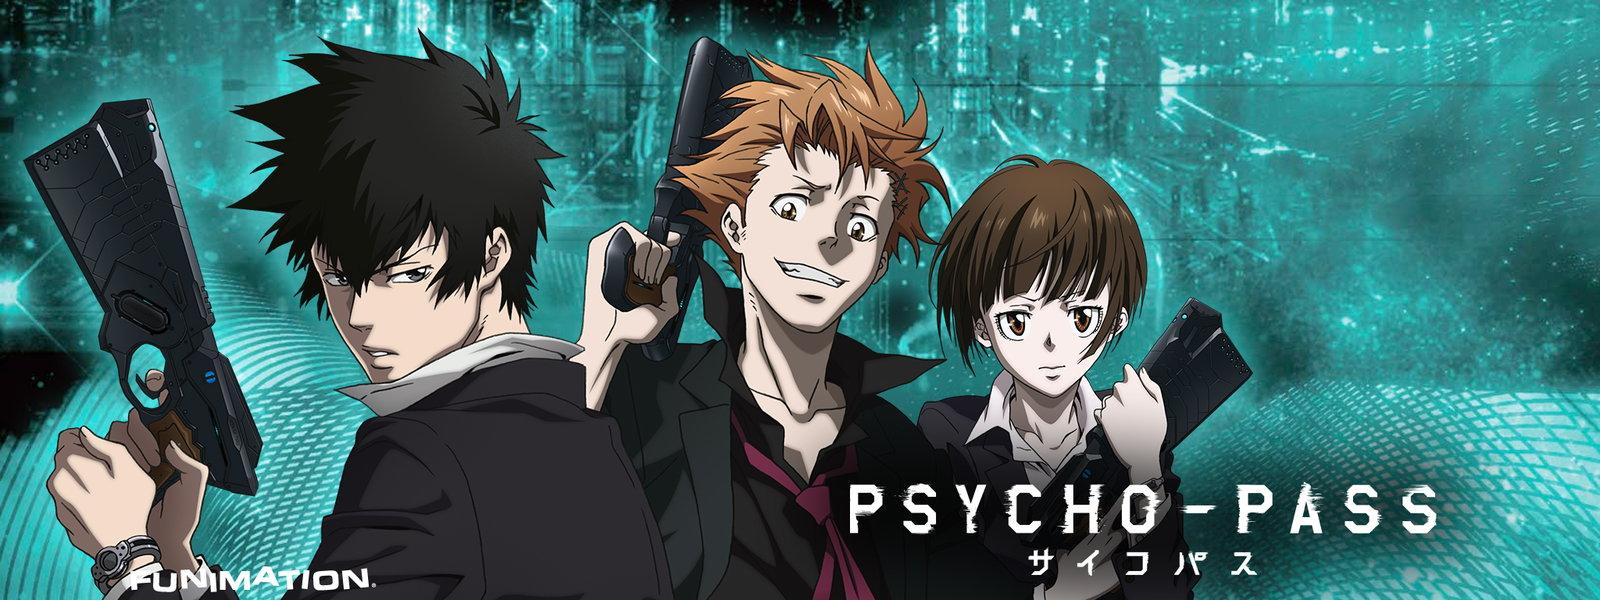 anime-psycho-pass